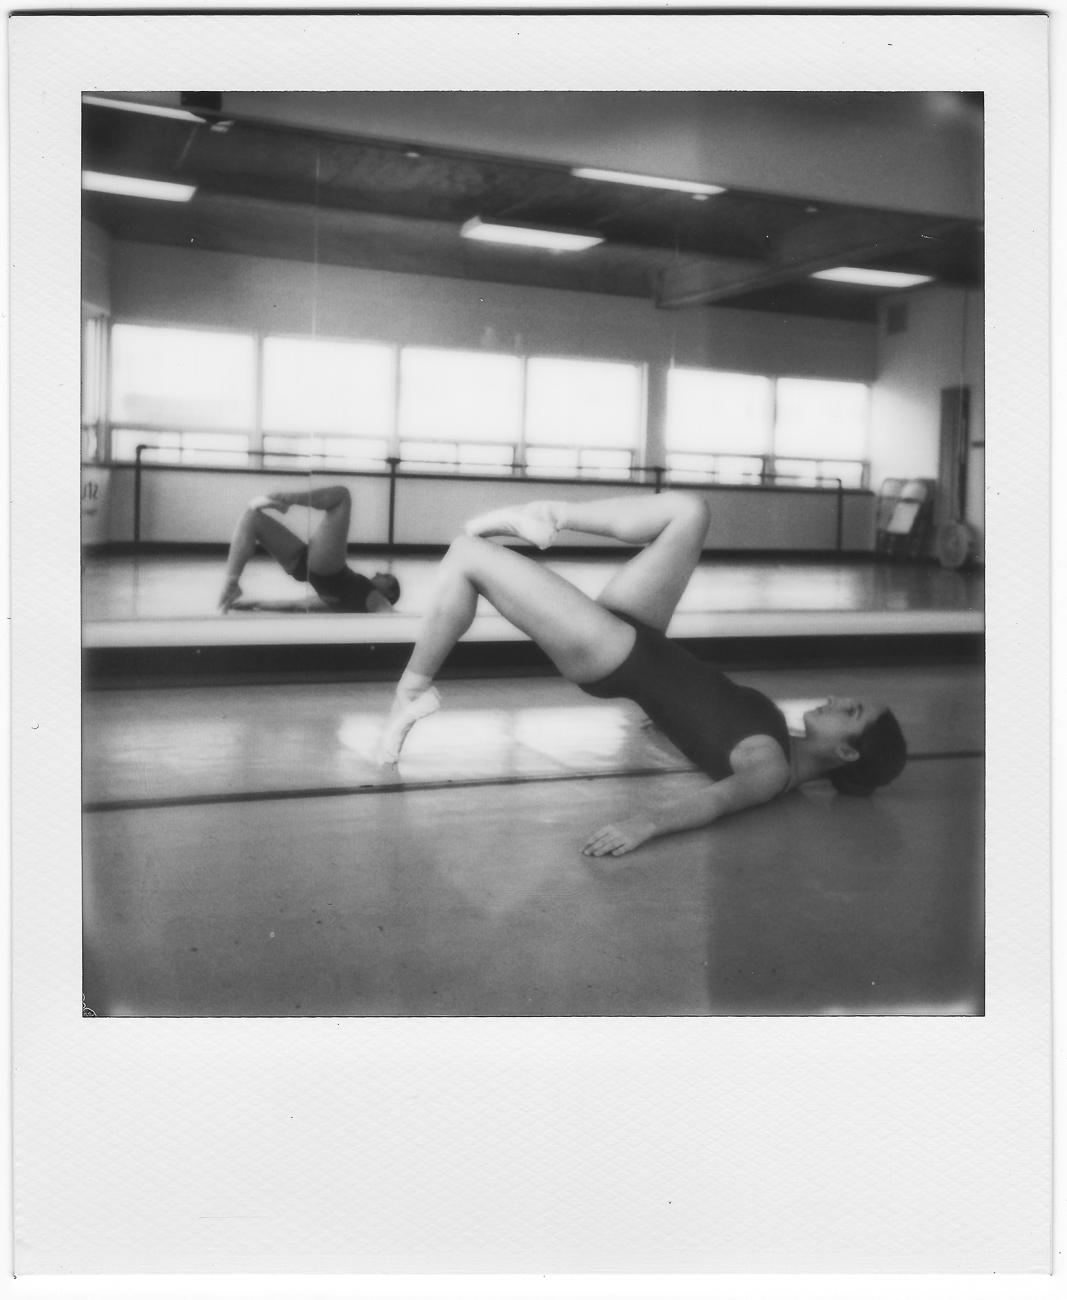 polaroid one step plus ballet dancer montreal